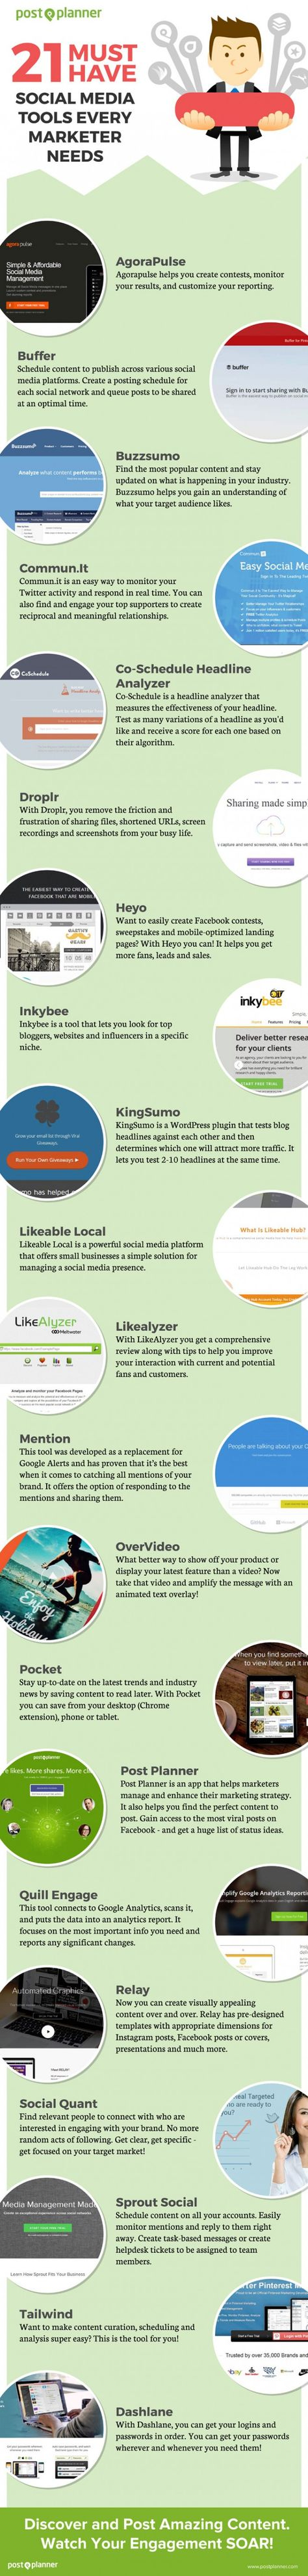 21 Social Media Tools for Smart Marketers #tools #socialmedia #media #social #digital #marketer #marketing Manuela Infante